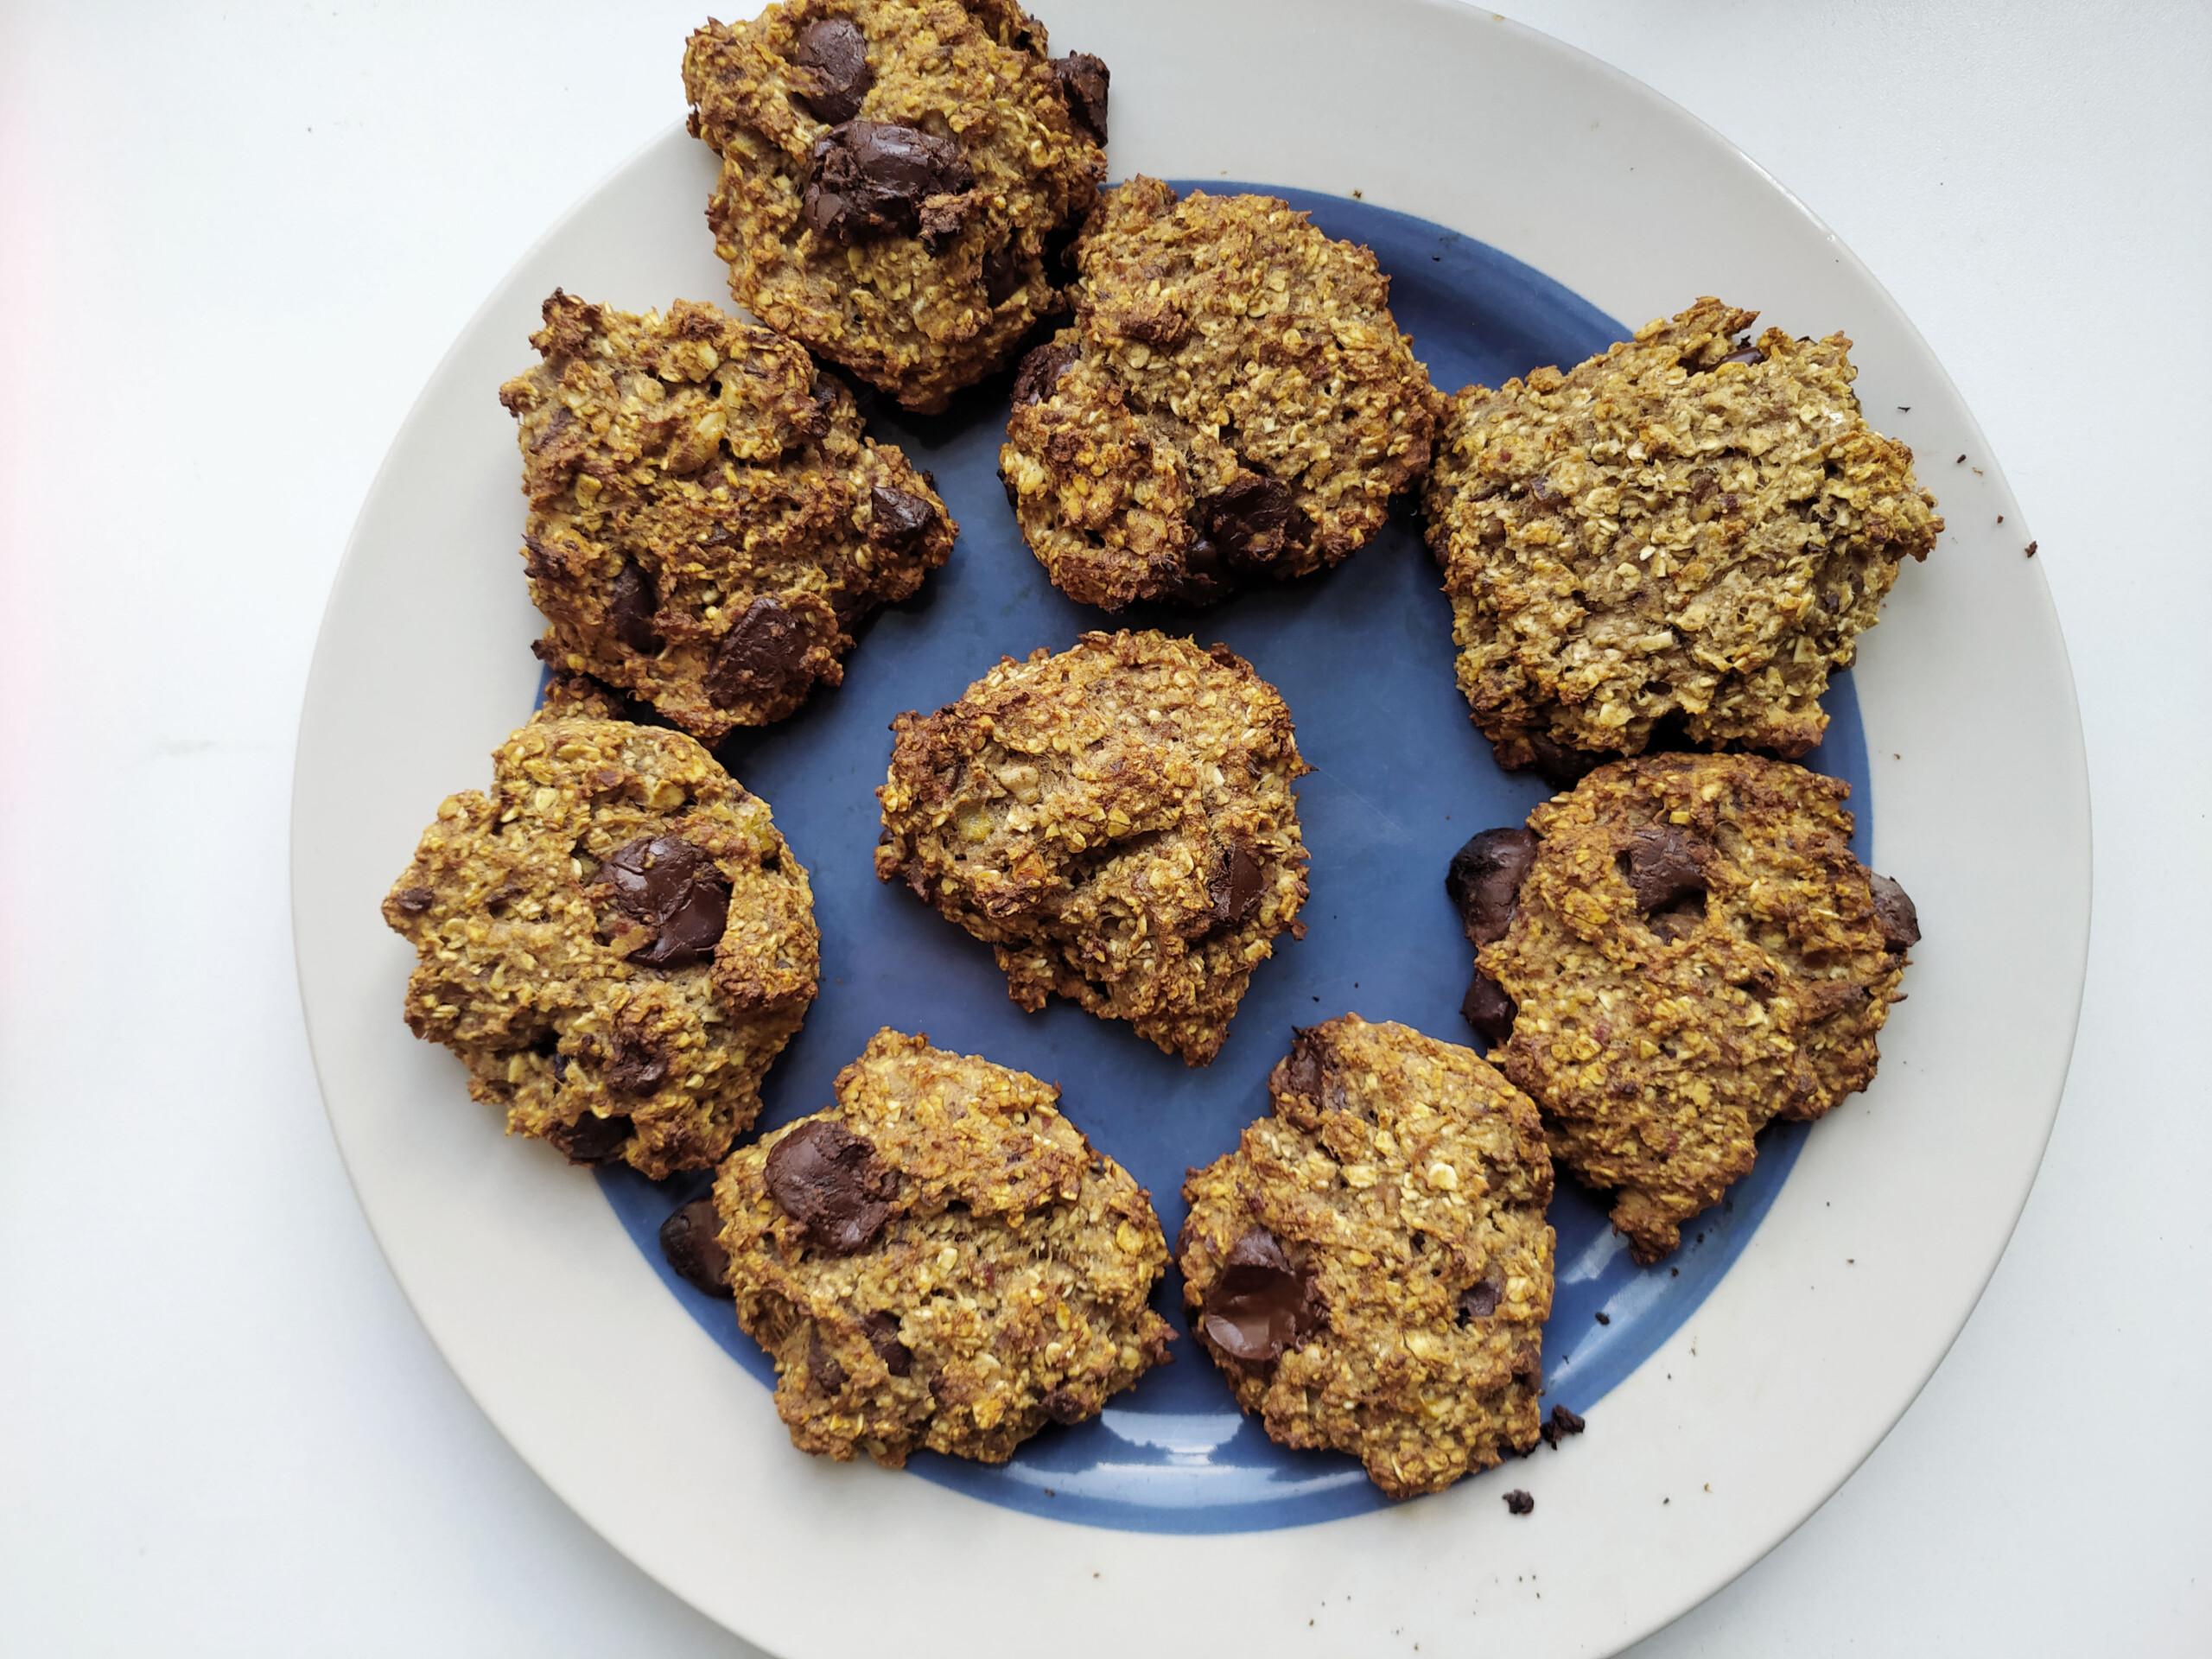 La recette des Cookies super healthy super gourmands !